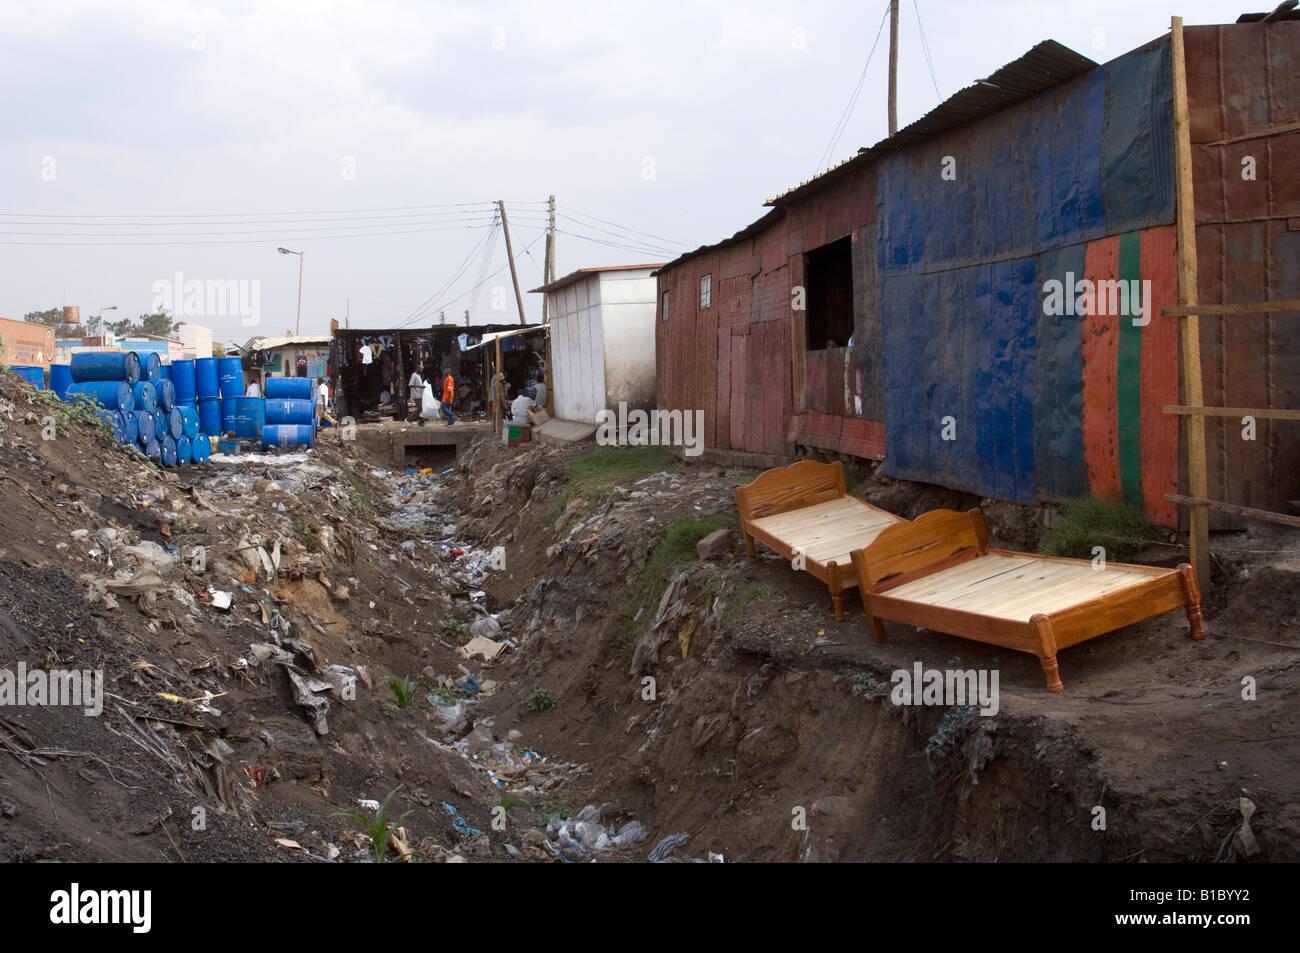 http://c7.alamy.com/comp/B1BYY2/sheds-and-drainage-channel-at-kamwala-market-lusaka-zambia-B1BYY2.jpg